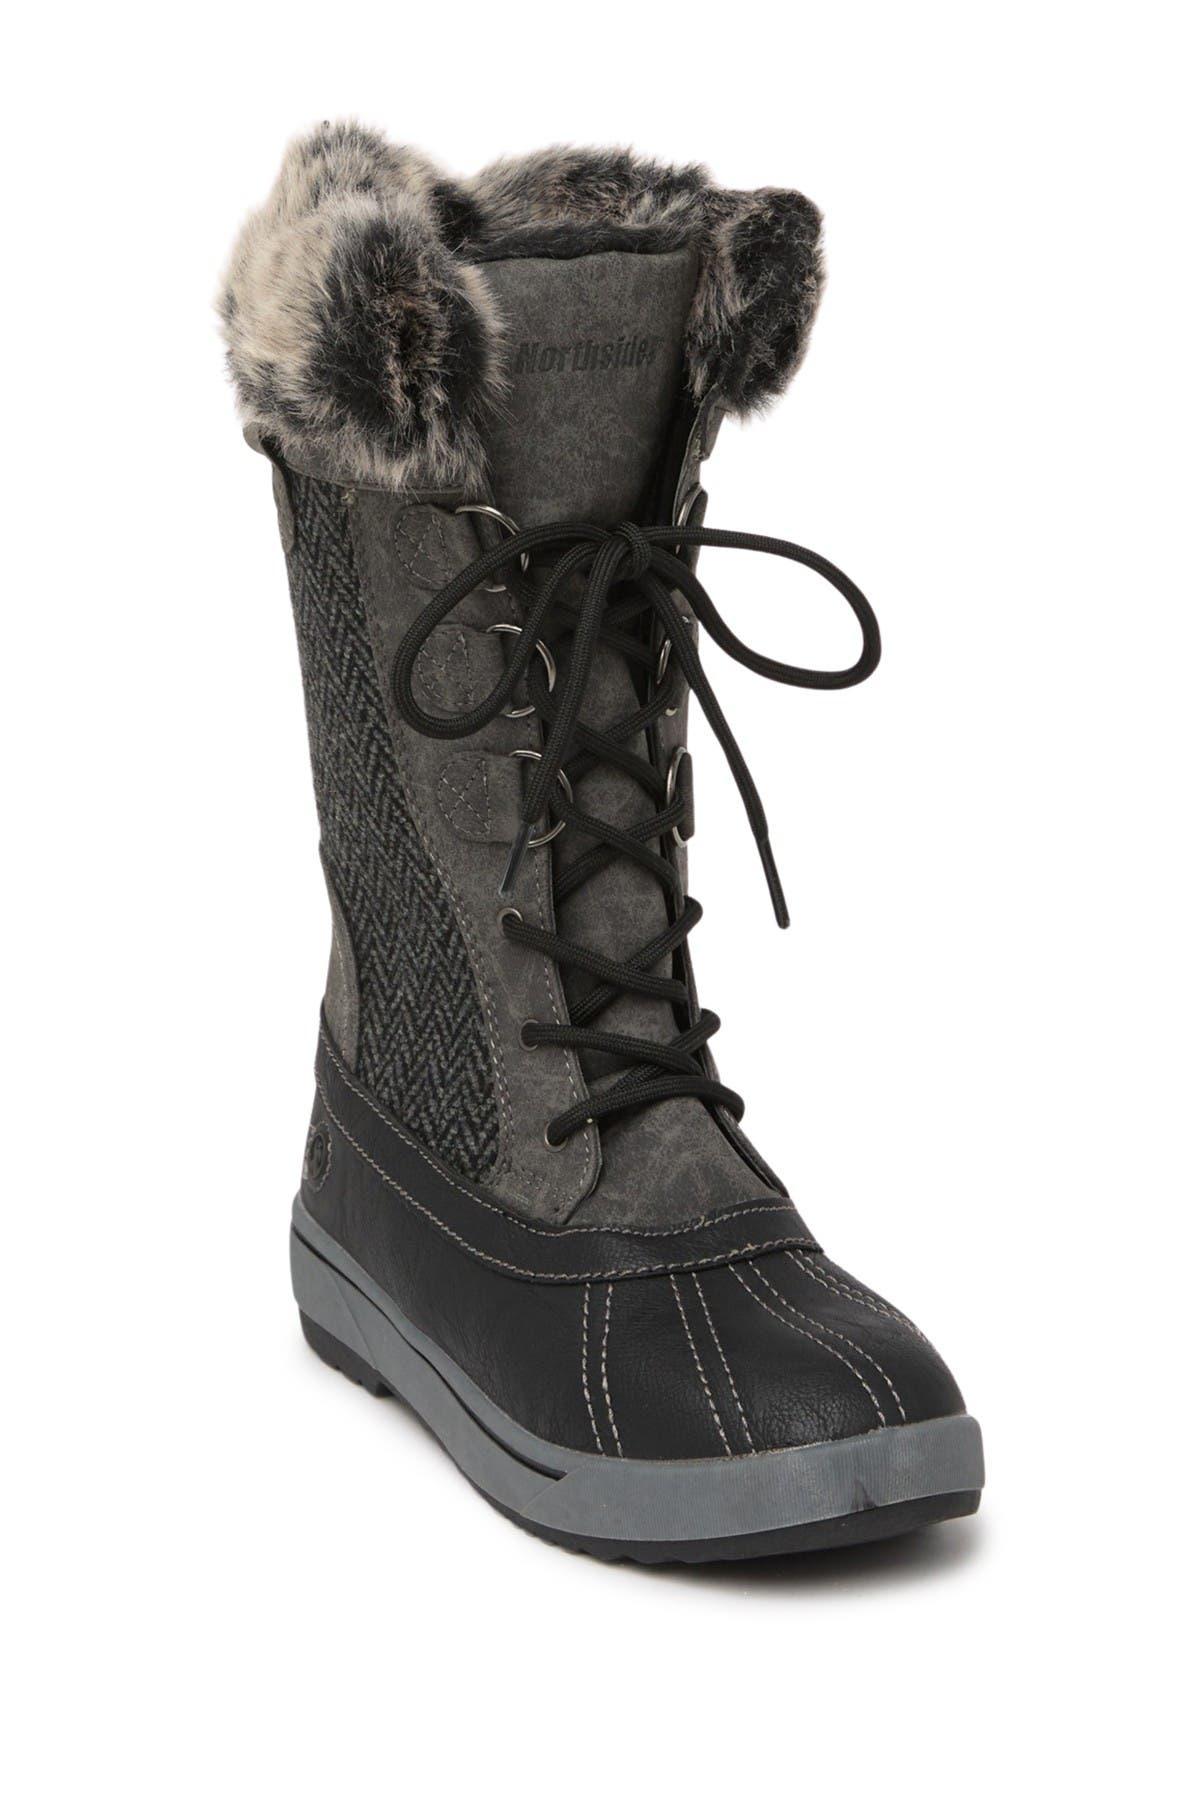 Image of NORTHSIDE Bishop Faux Fur Lined Duck Boot